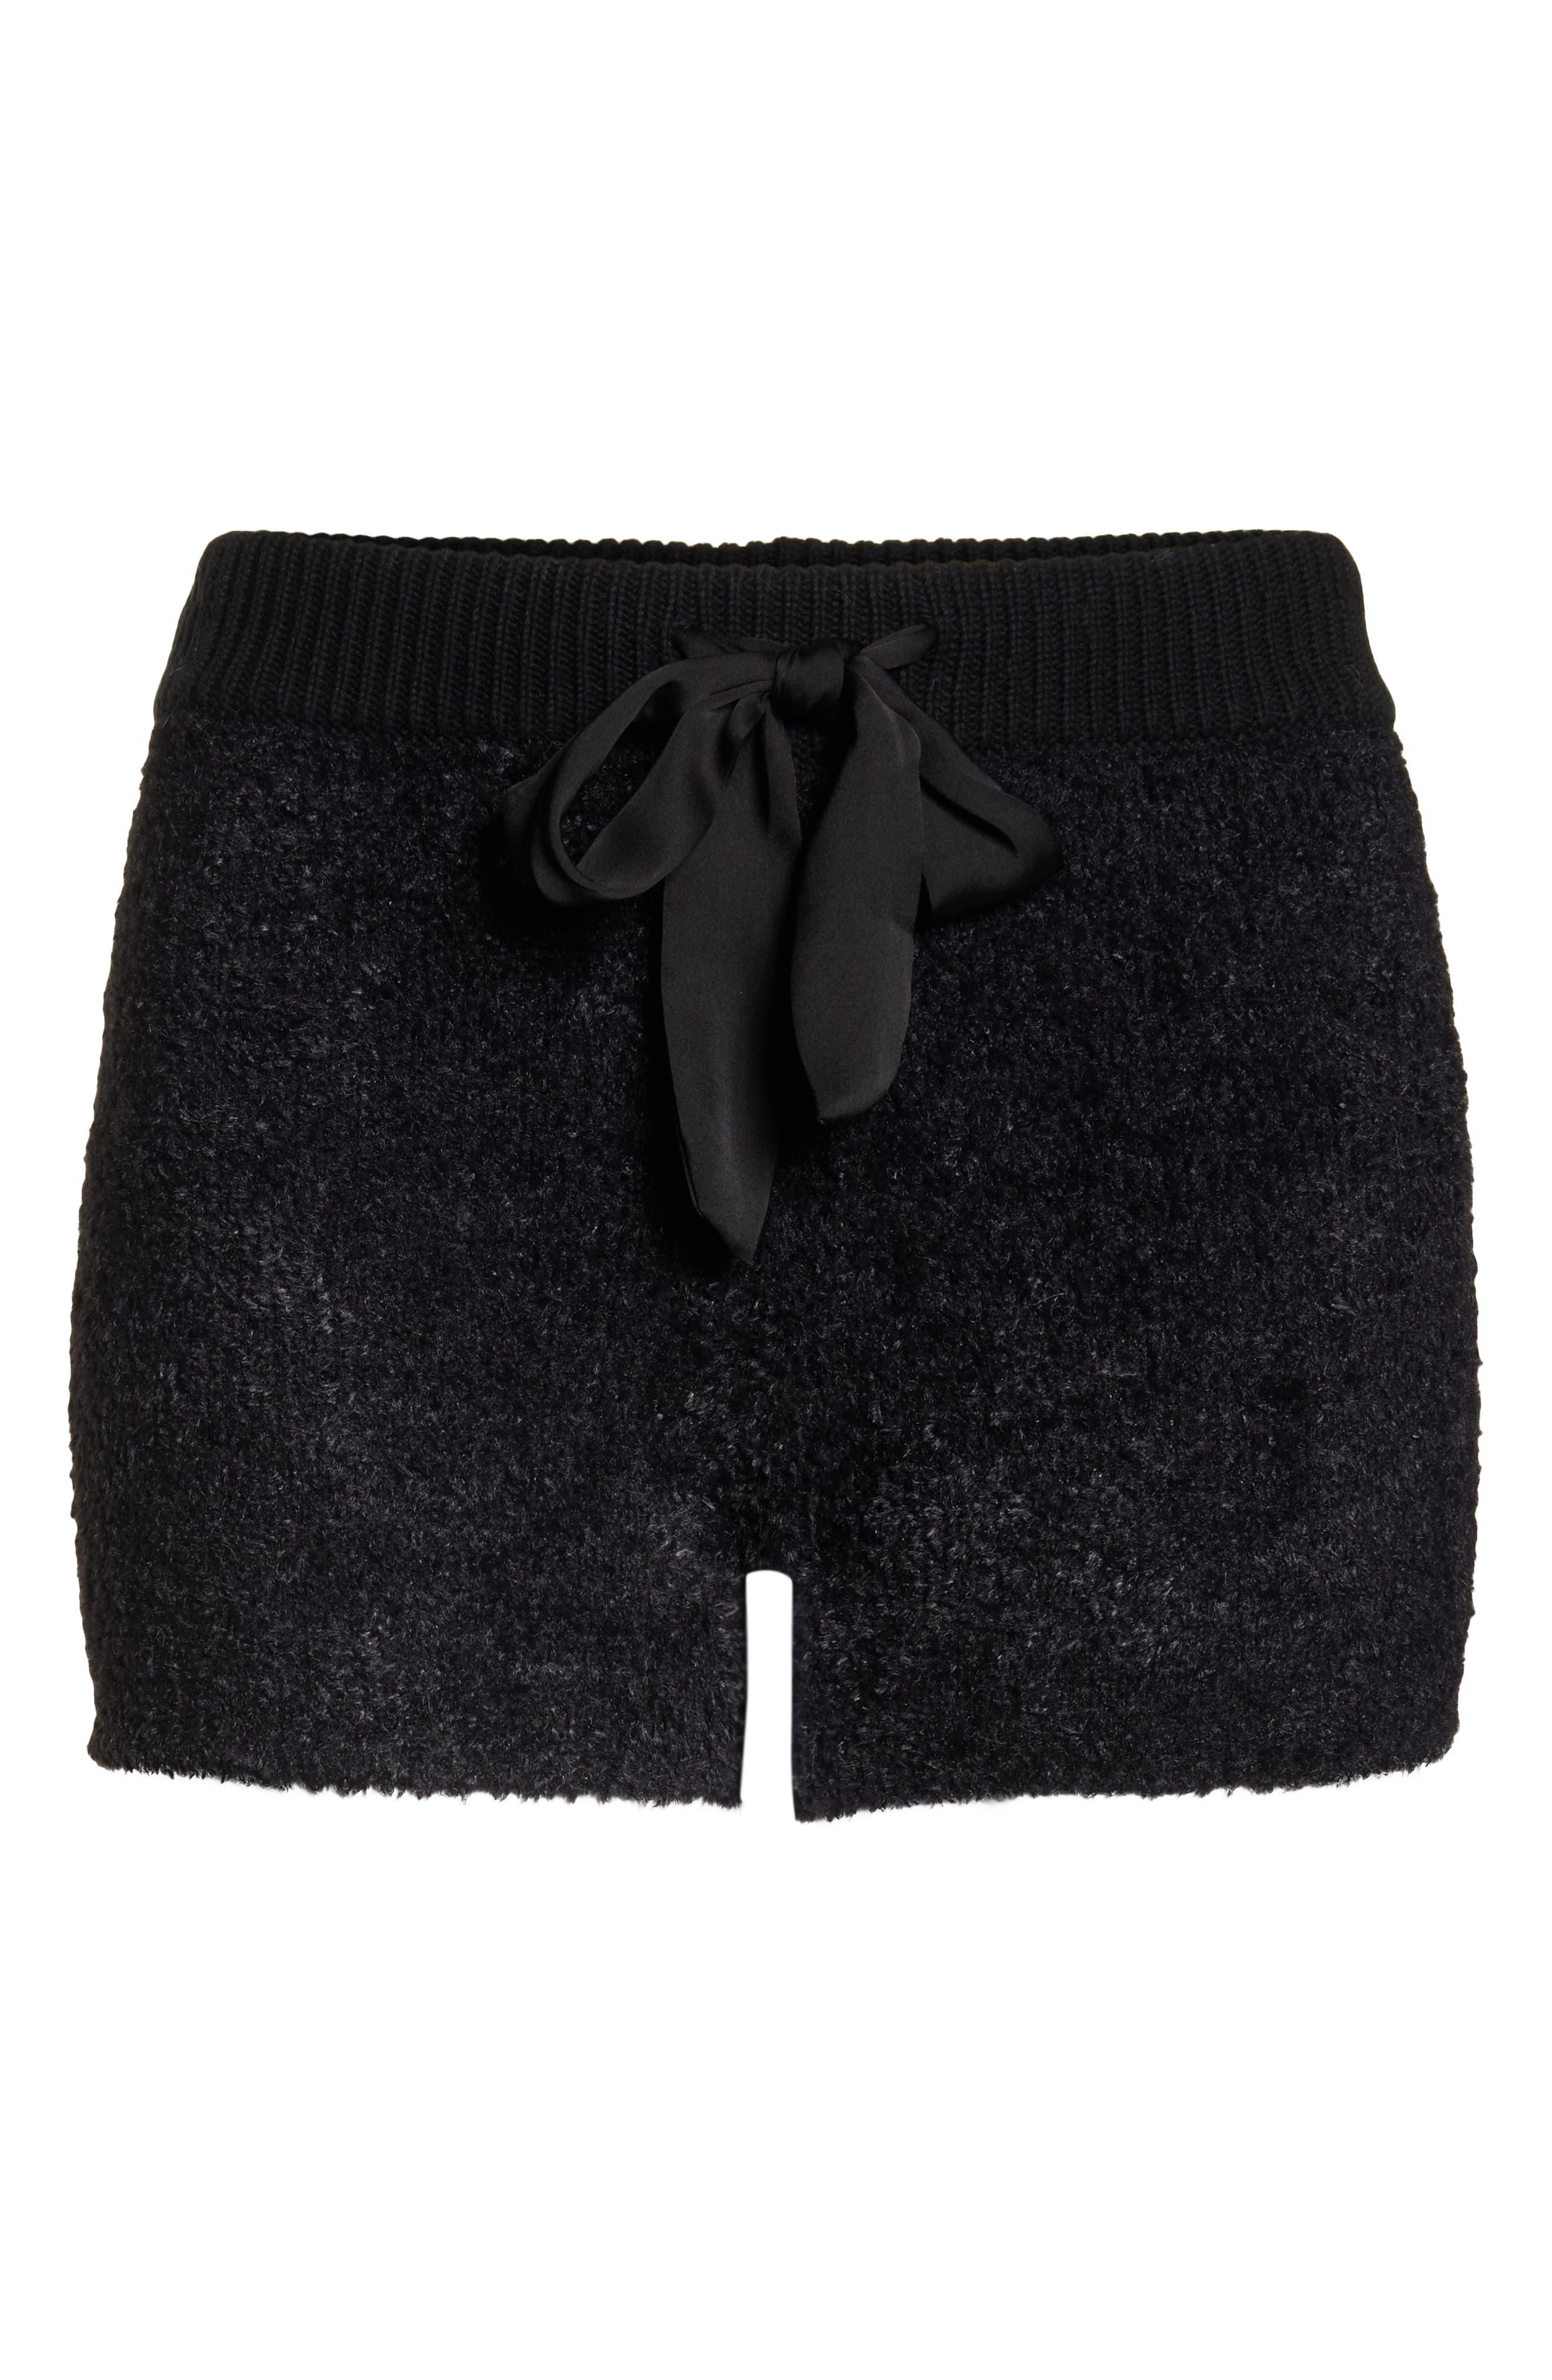 Fuzzy Lounge Shorts,                             Alternate thumbnail 6, color,                             BLACK